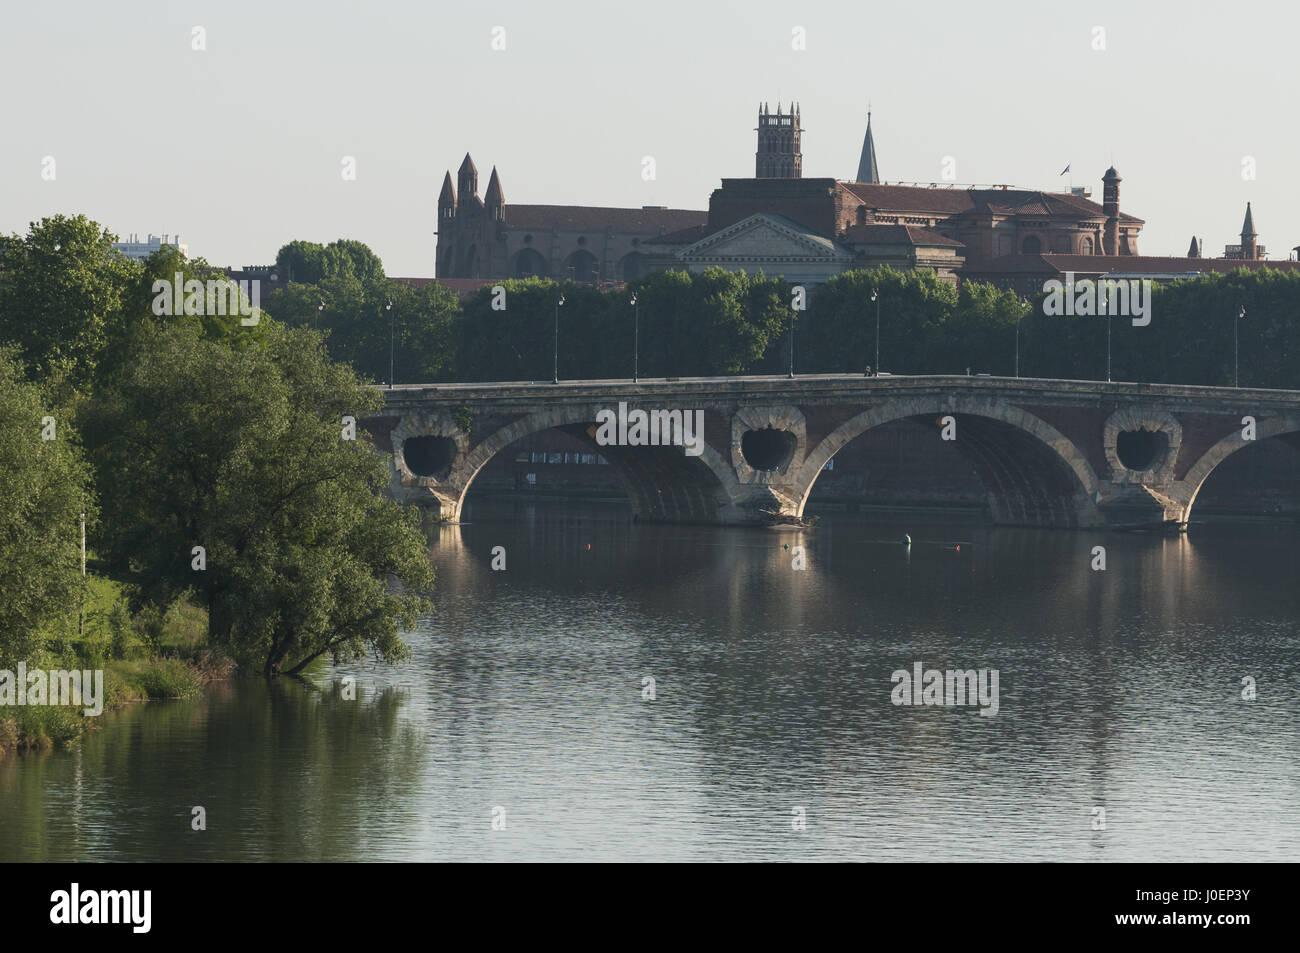 France, Toulouse, city with Pont Neuf and Basillica St Sernin - Stock Image